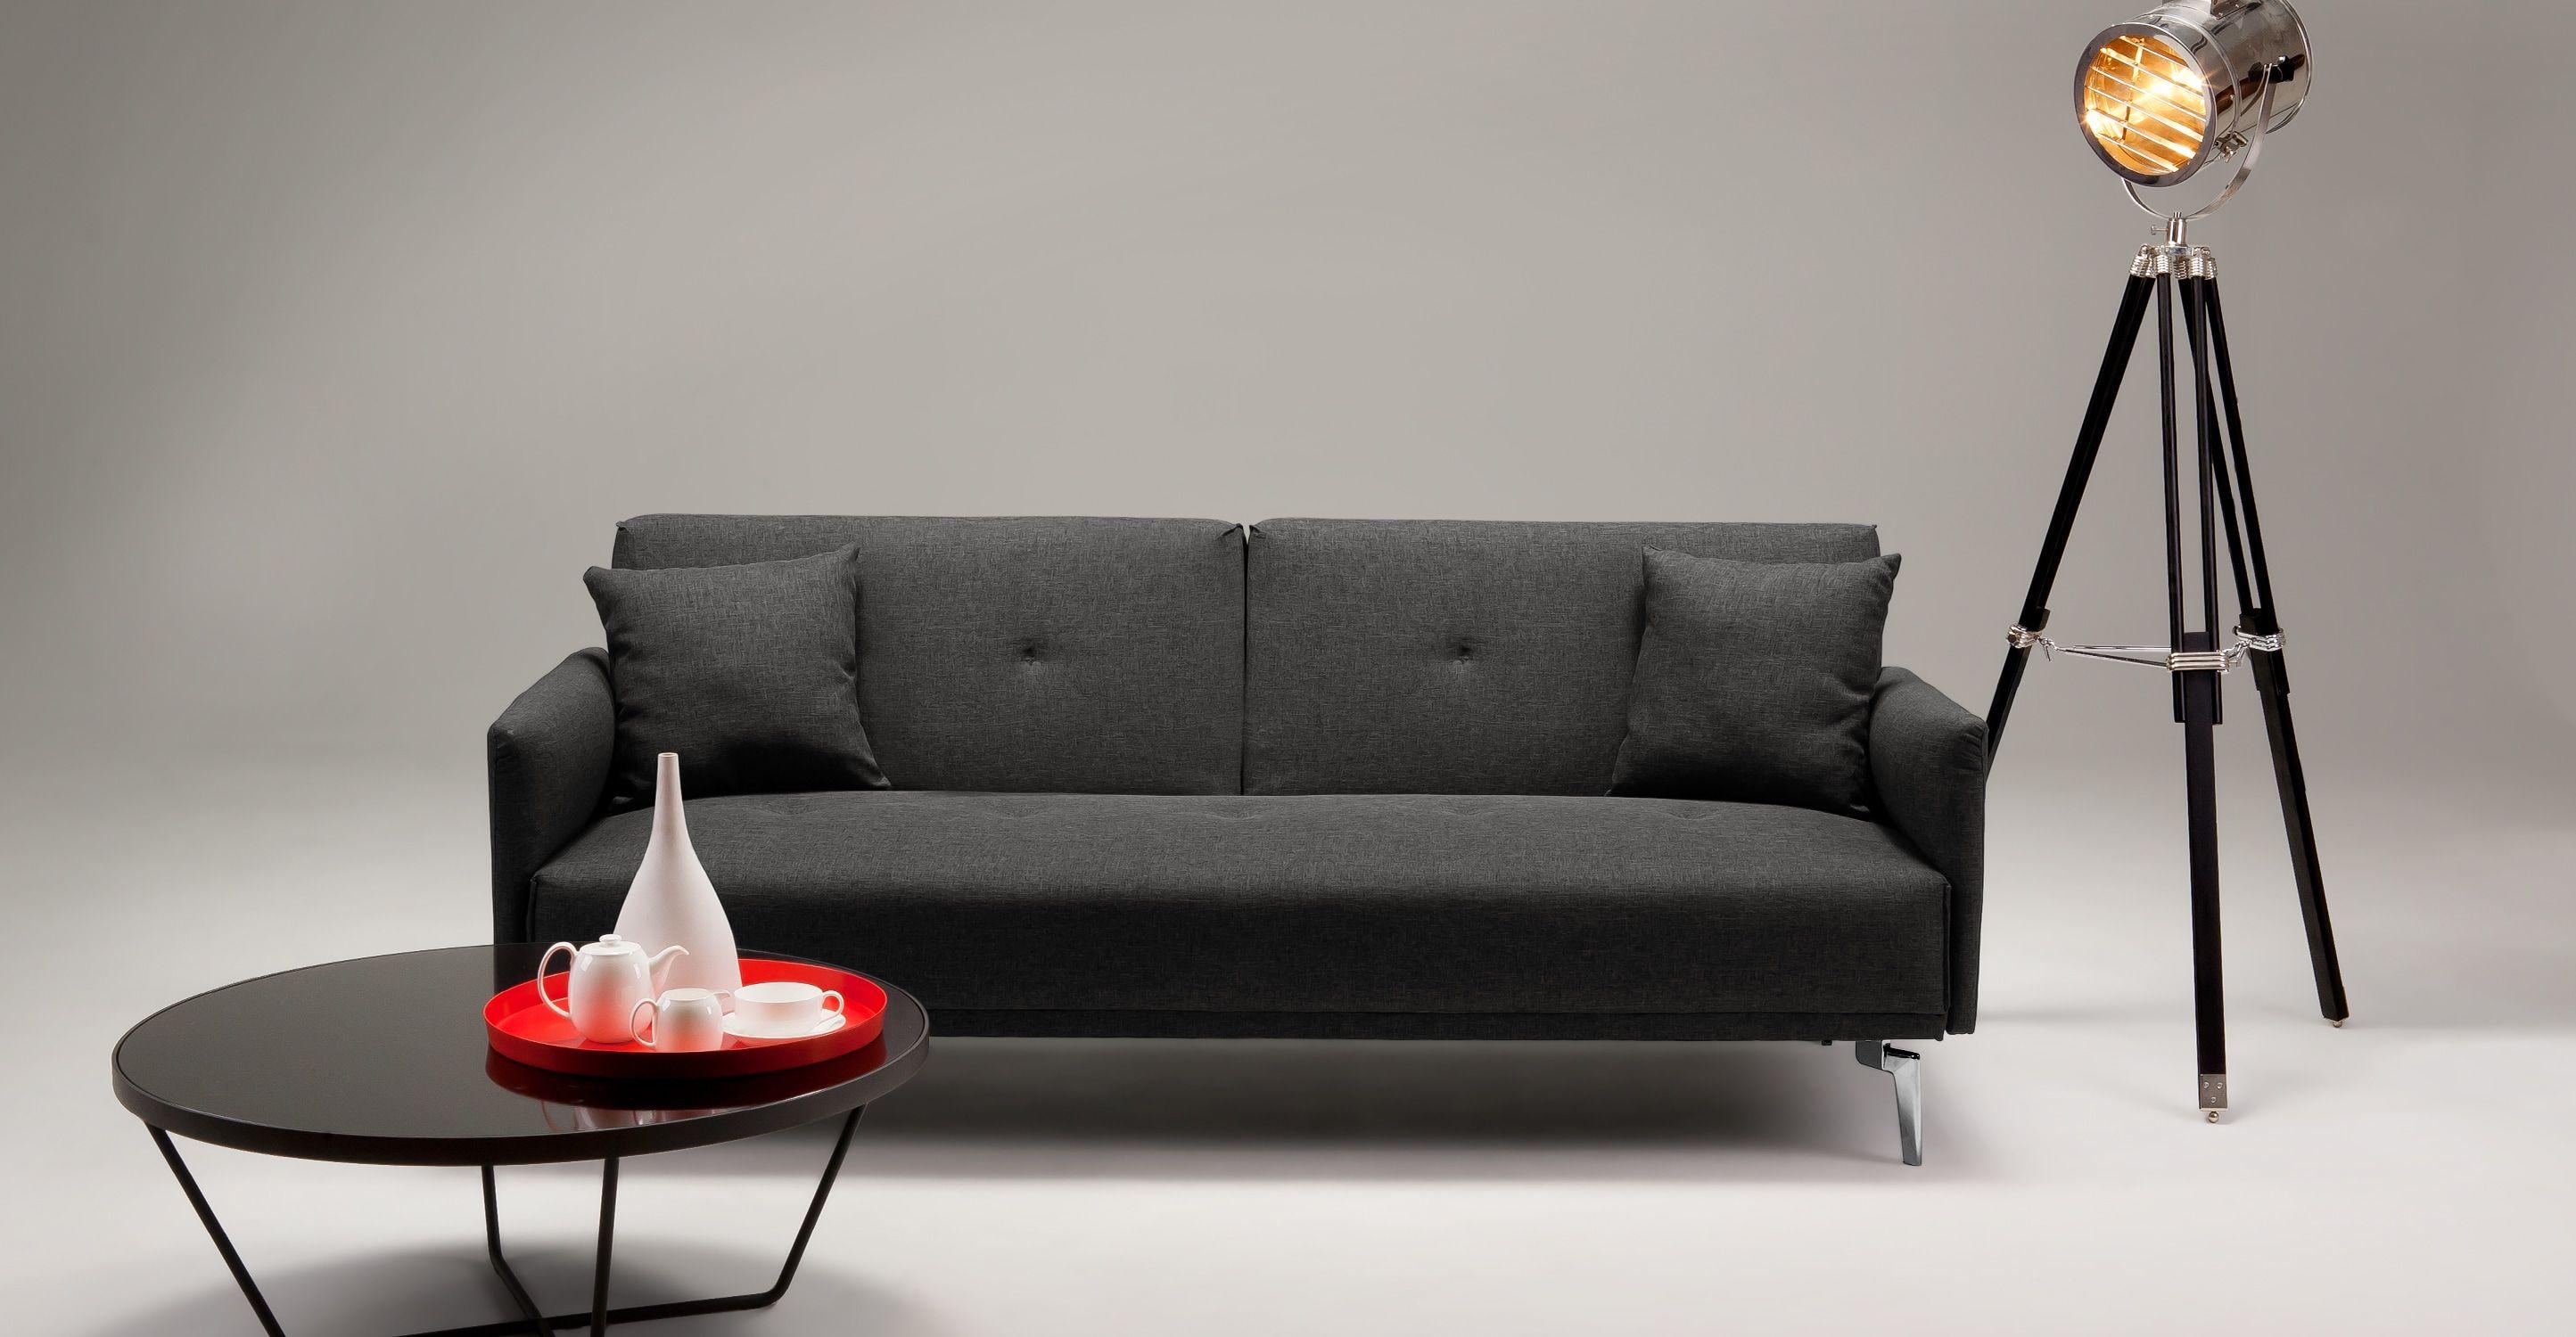 MADE Grey Sofa bed Grey sofa bed, Sofa, Sofa bed